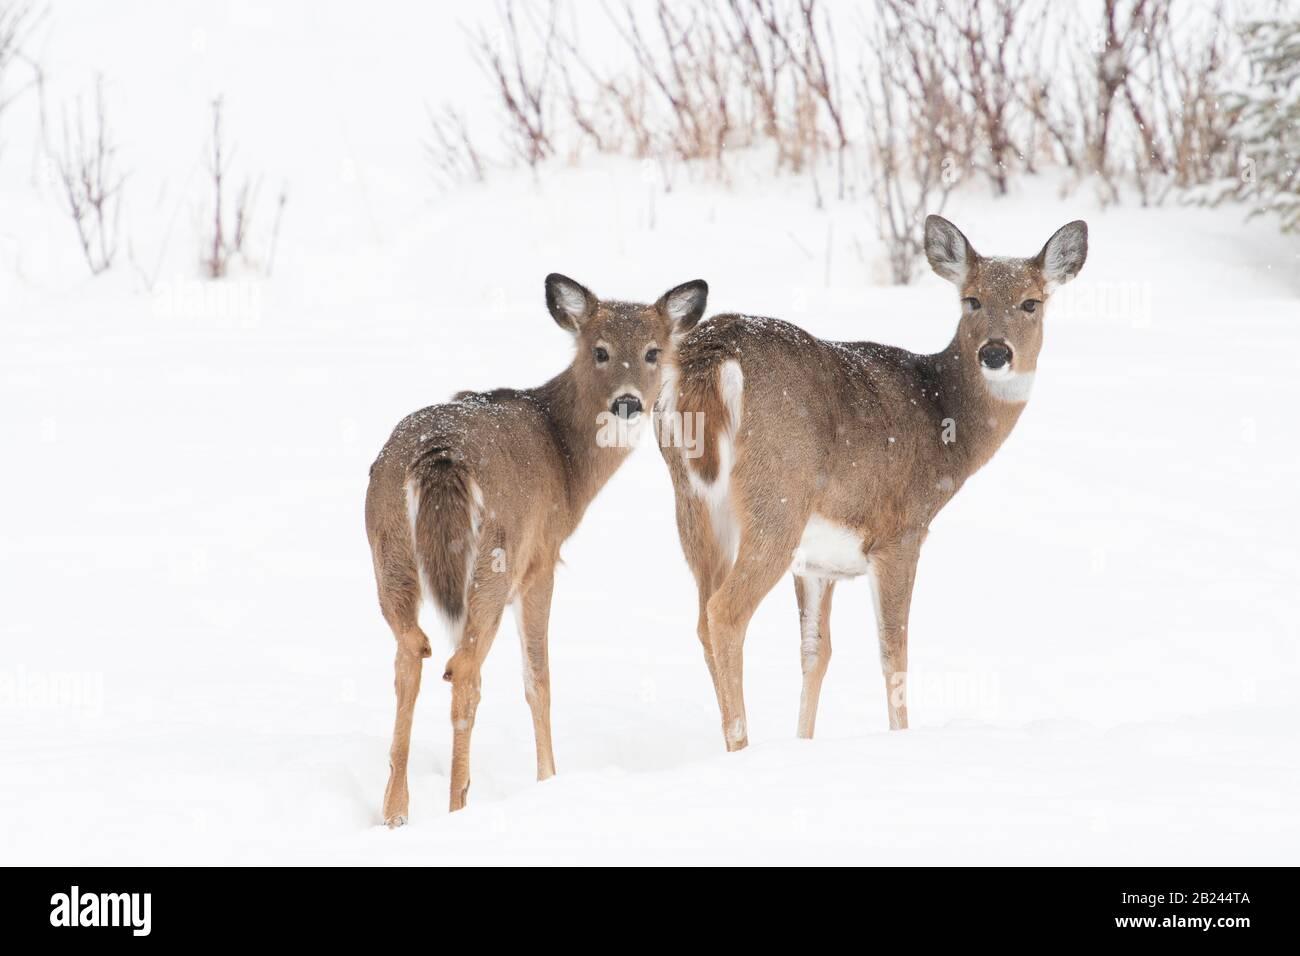 White-taile deer (Odocoileus virginianus), Winter, Eastern North America, by Dominique Braud/Dembinsky Photo Assoc Stock Photo